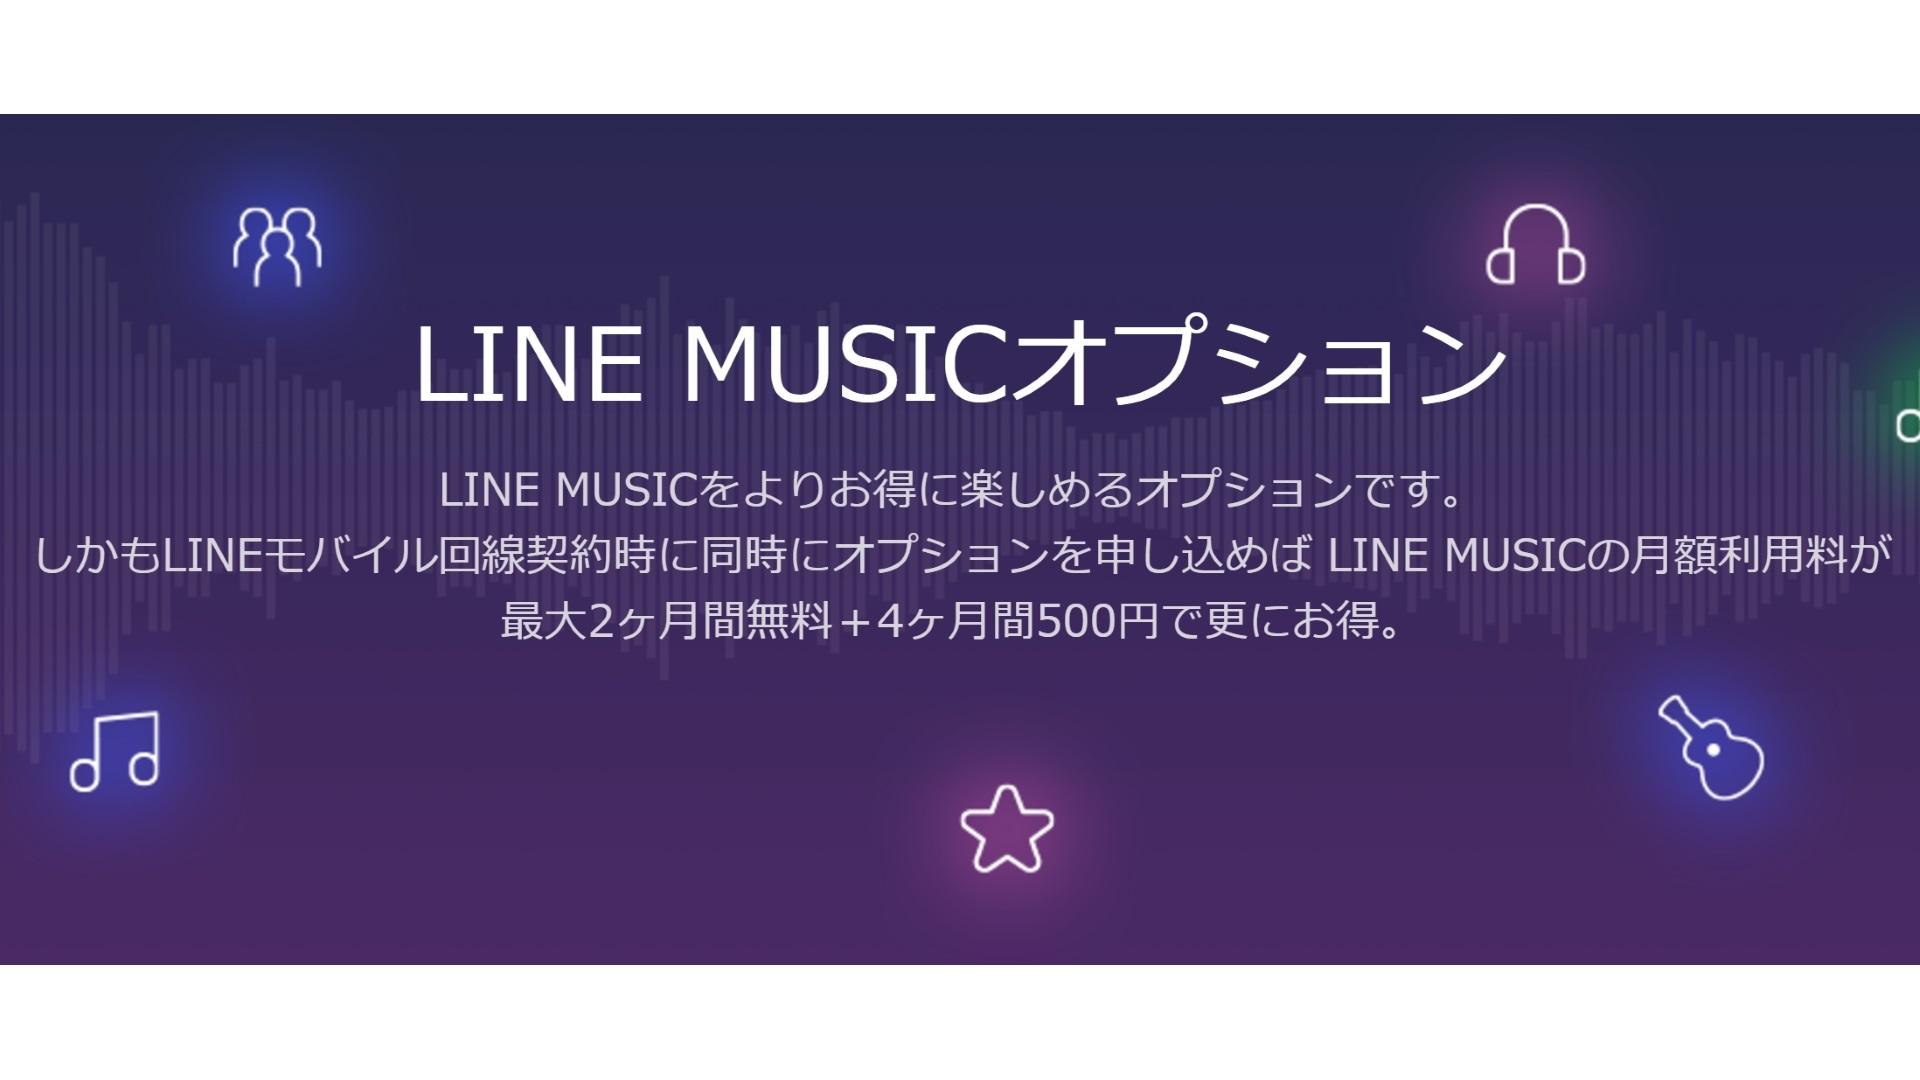 「LINEモバイル」、月額750円の「LINE MUSICオプション」提供開始